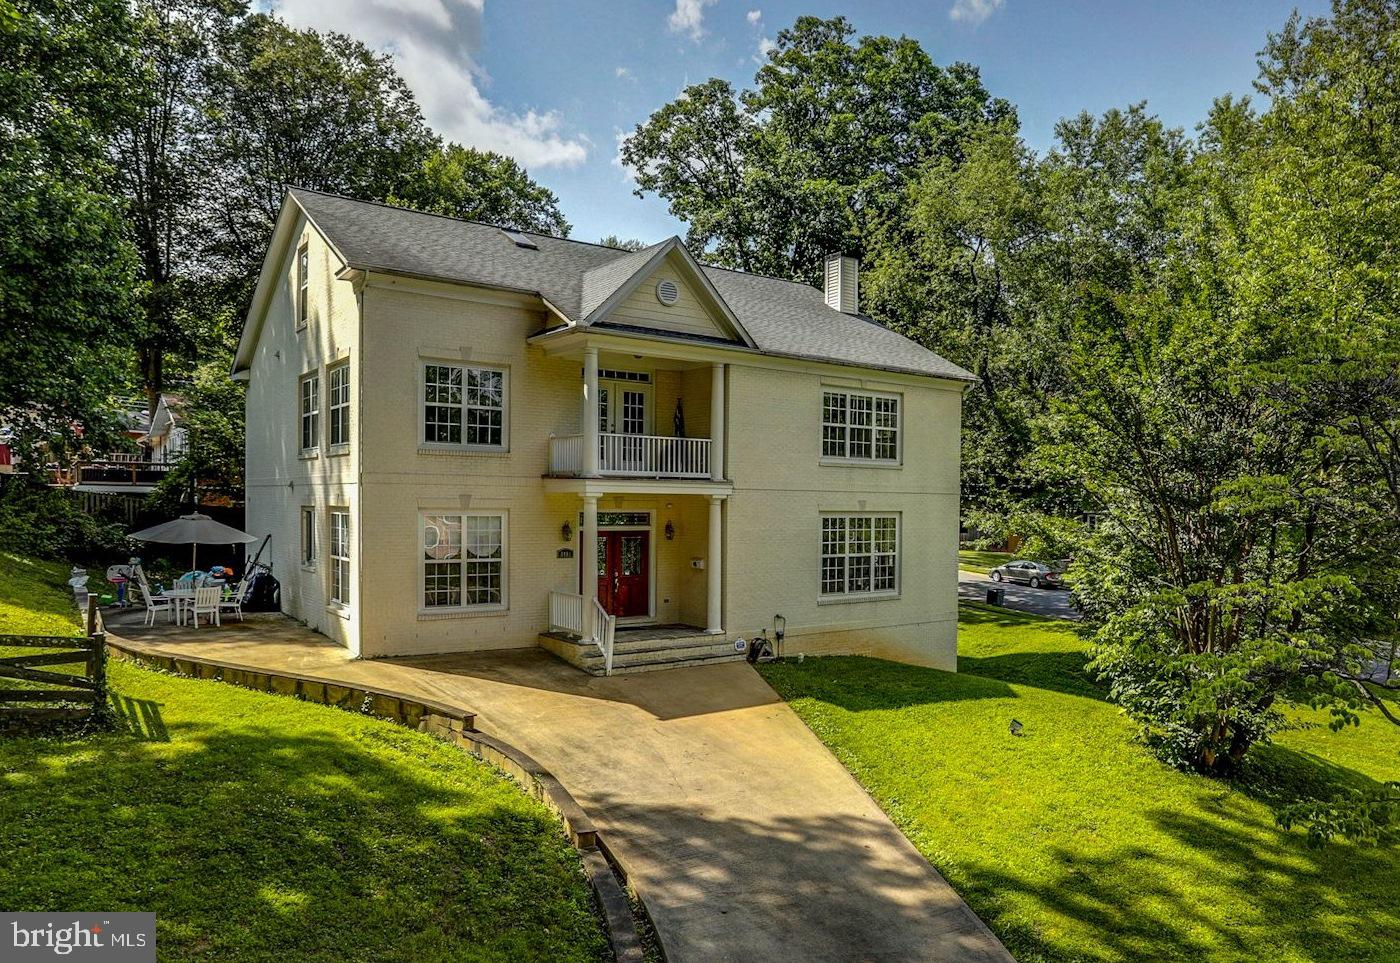 3401  Park Hill,  Fairfax, VA